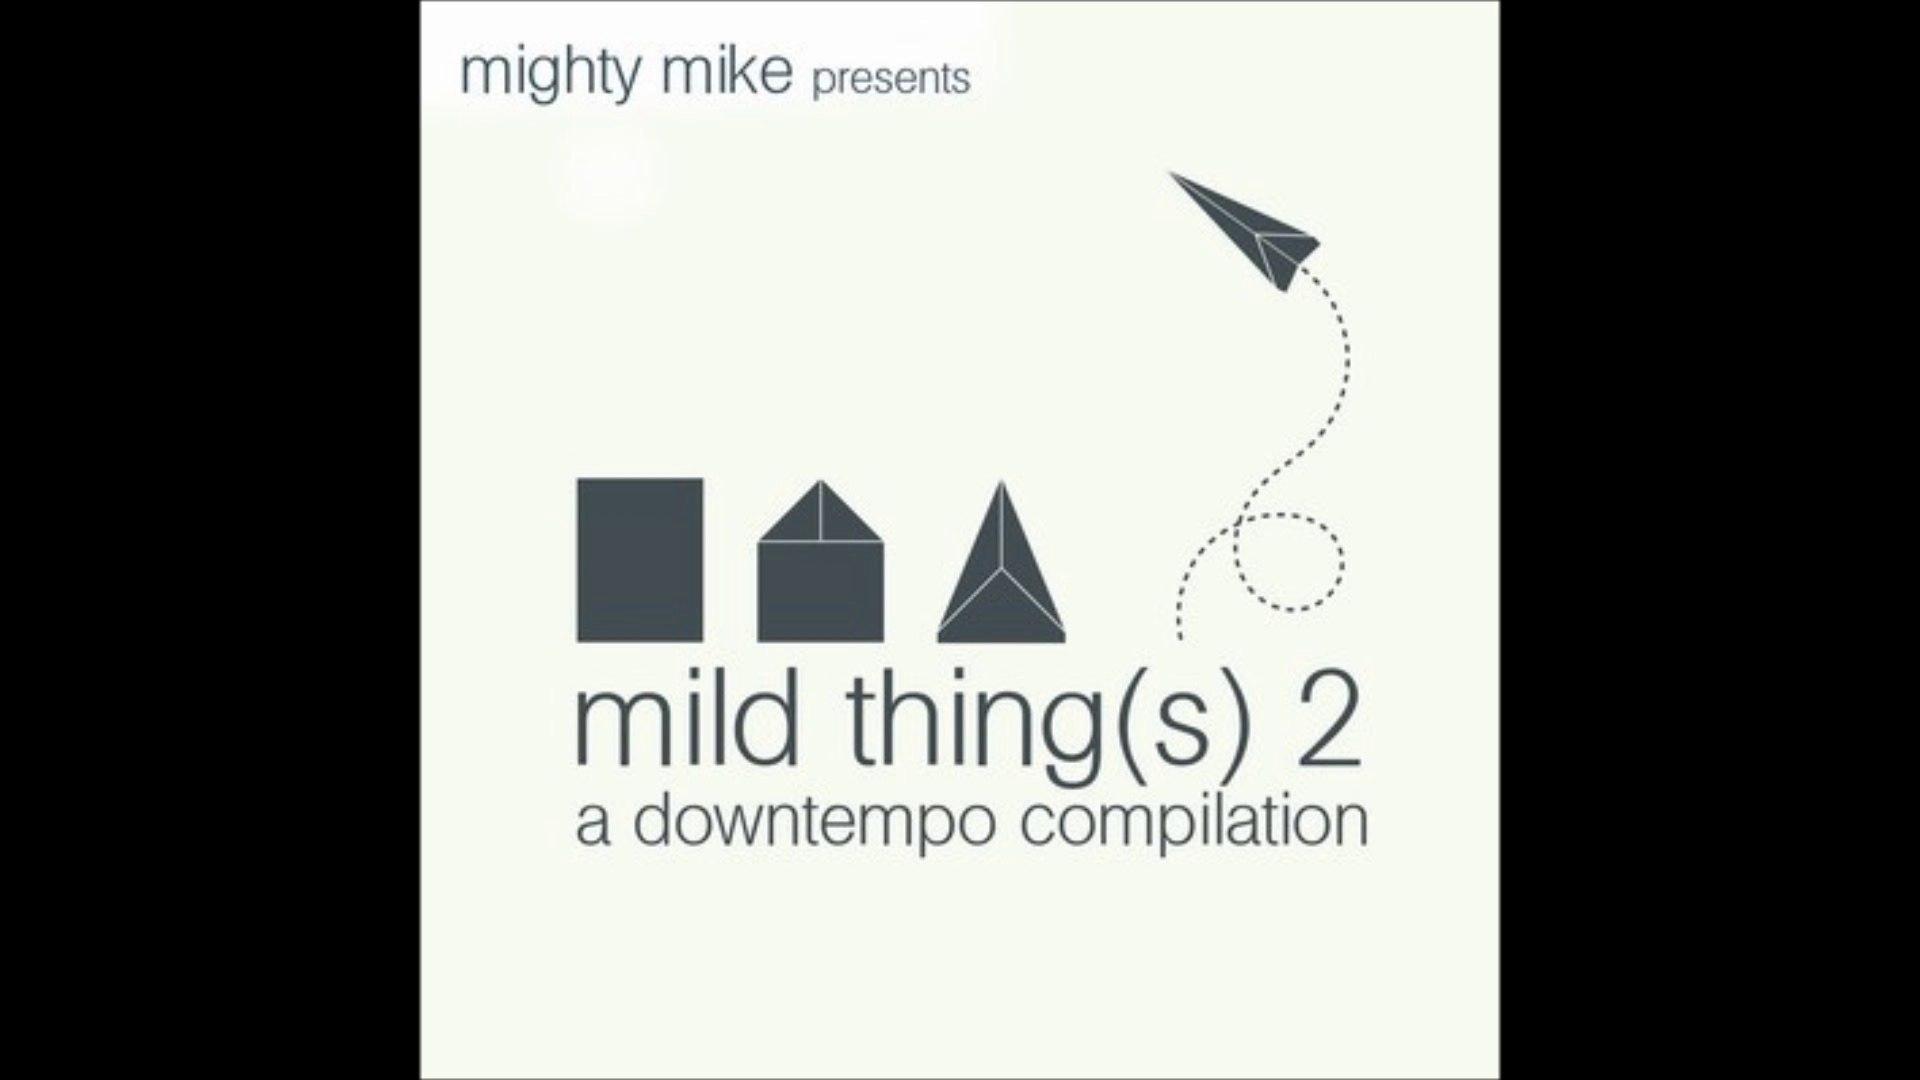 sexy people Mighty Mike remix da ya think I'm sexy vs Rod Stewart / John Legend 2011 - mild thi